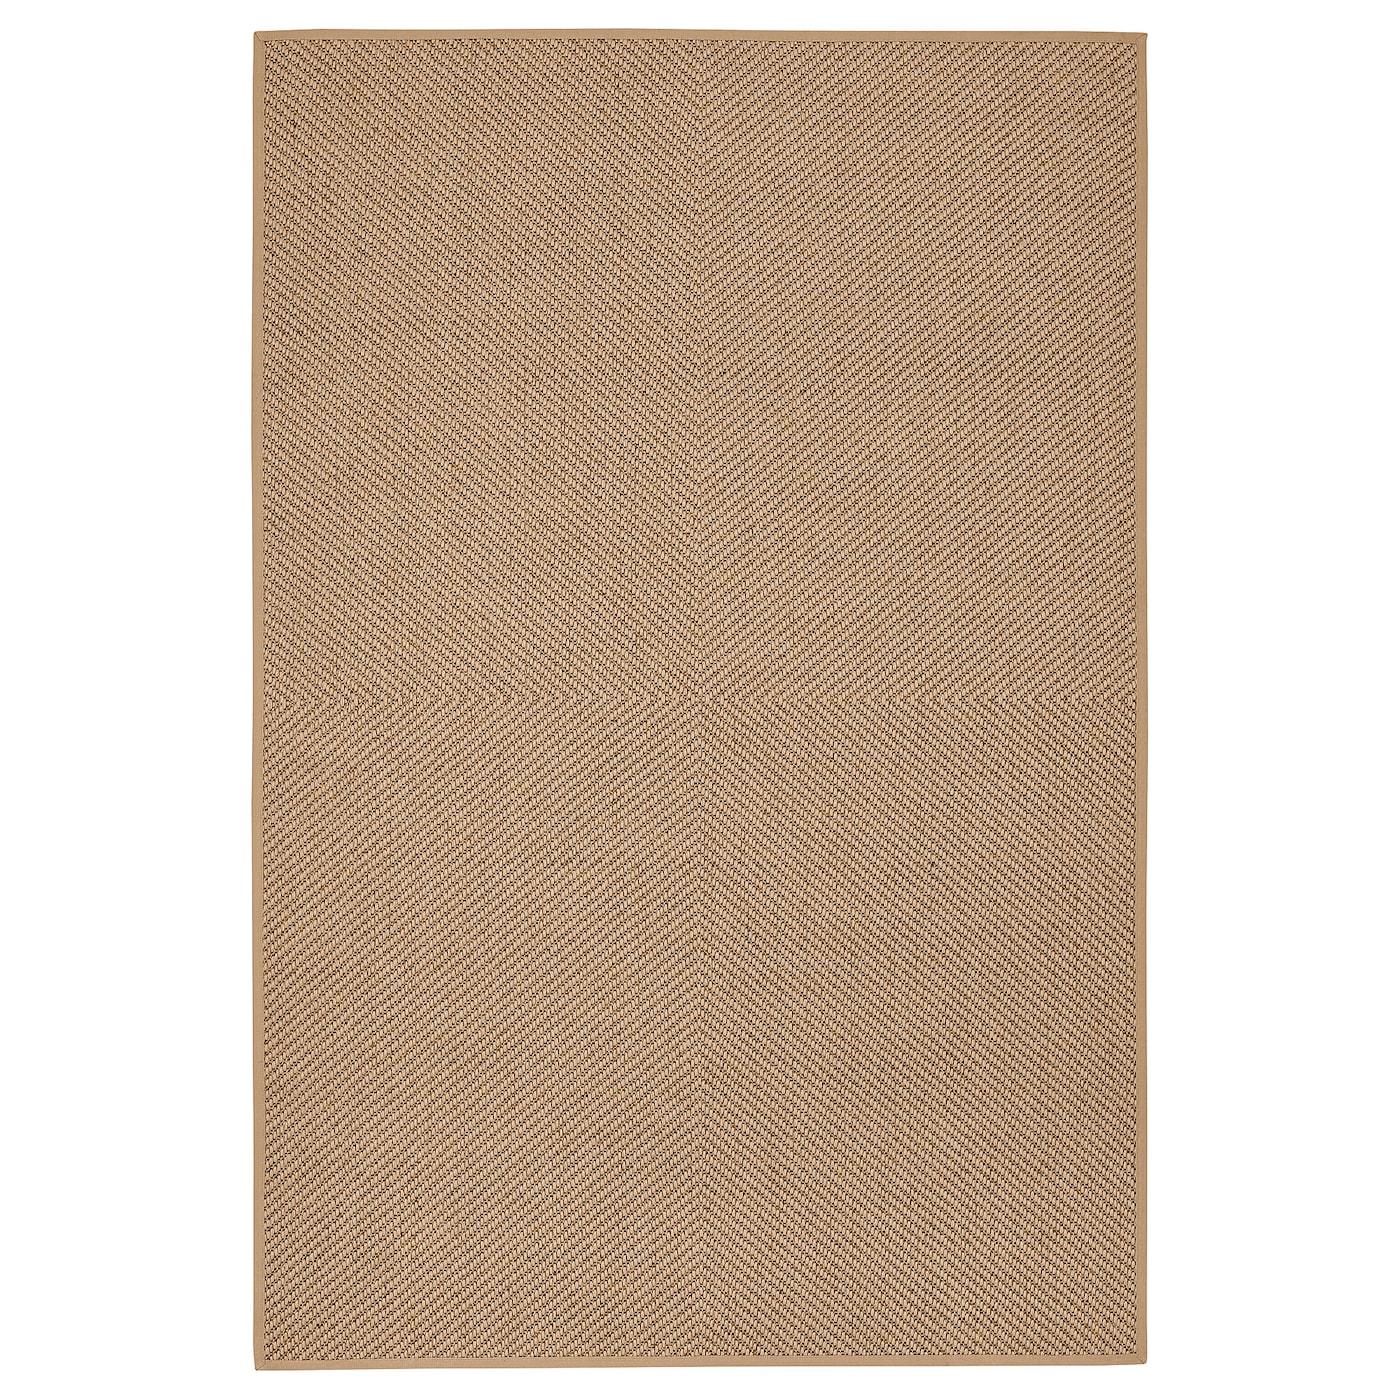 Tapis Carpettes Design Scandinave Pas Cher Ikea